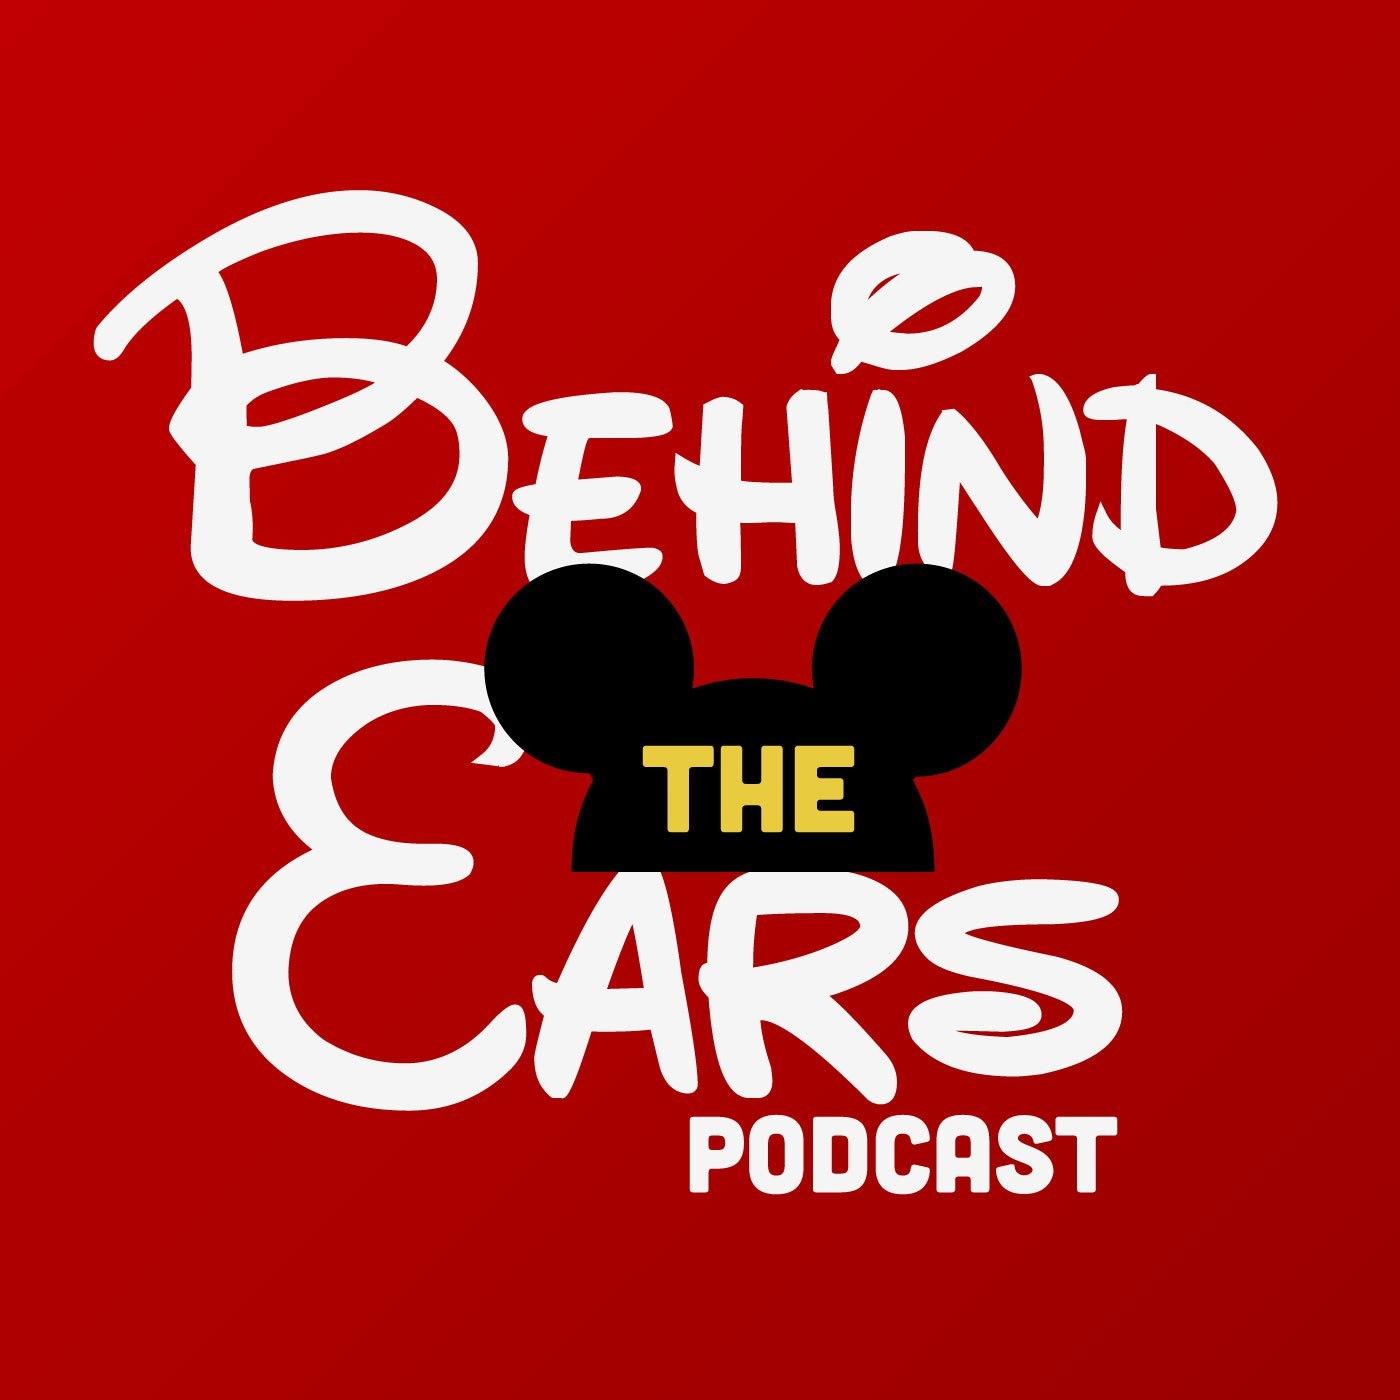 Behind The Ears